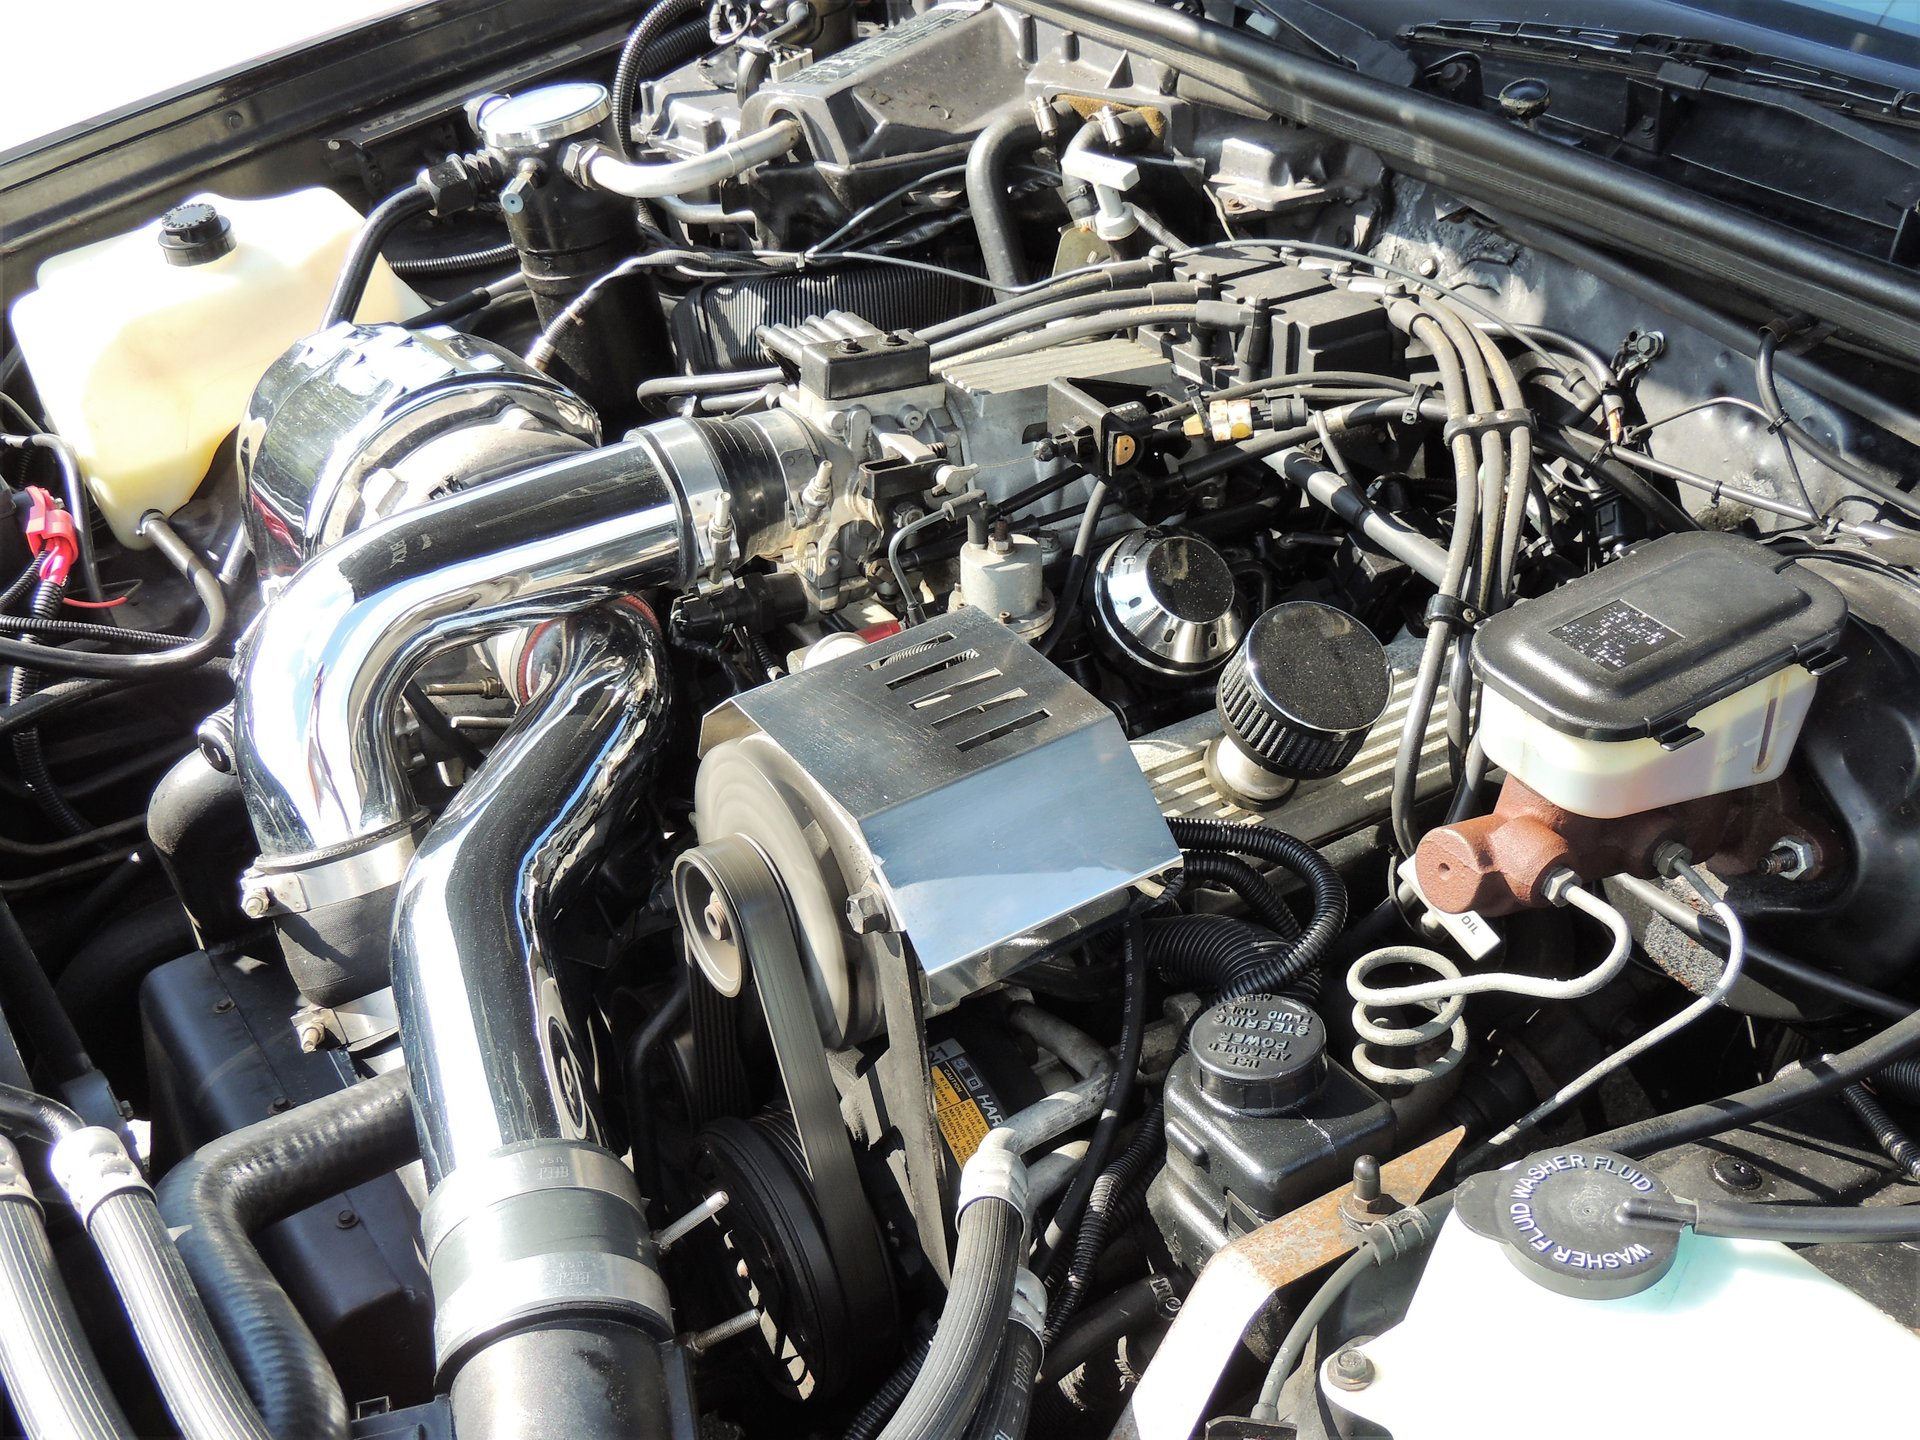 1987 Buick Grand National | Premier Auction